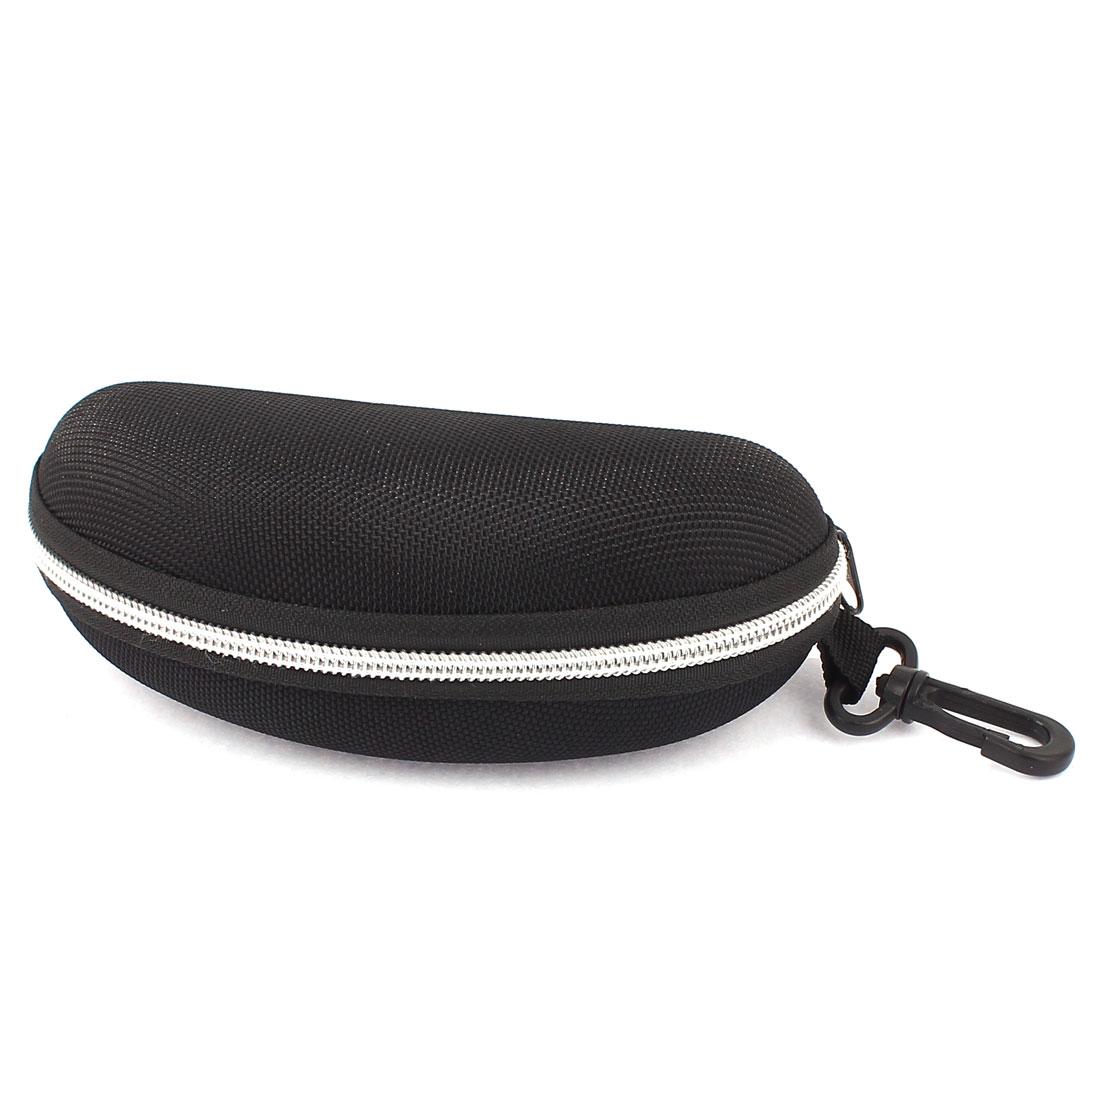 Zipper Clousure Sunglass Eyeglasses Eyewear Case Box Holder w Belt Loop